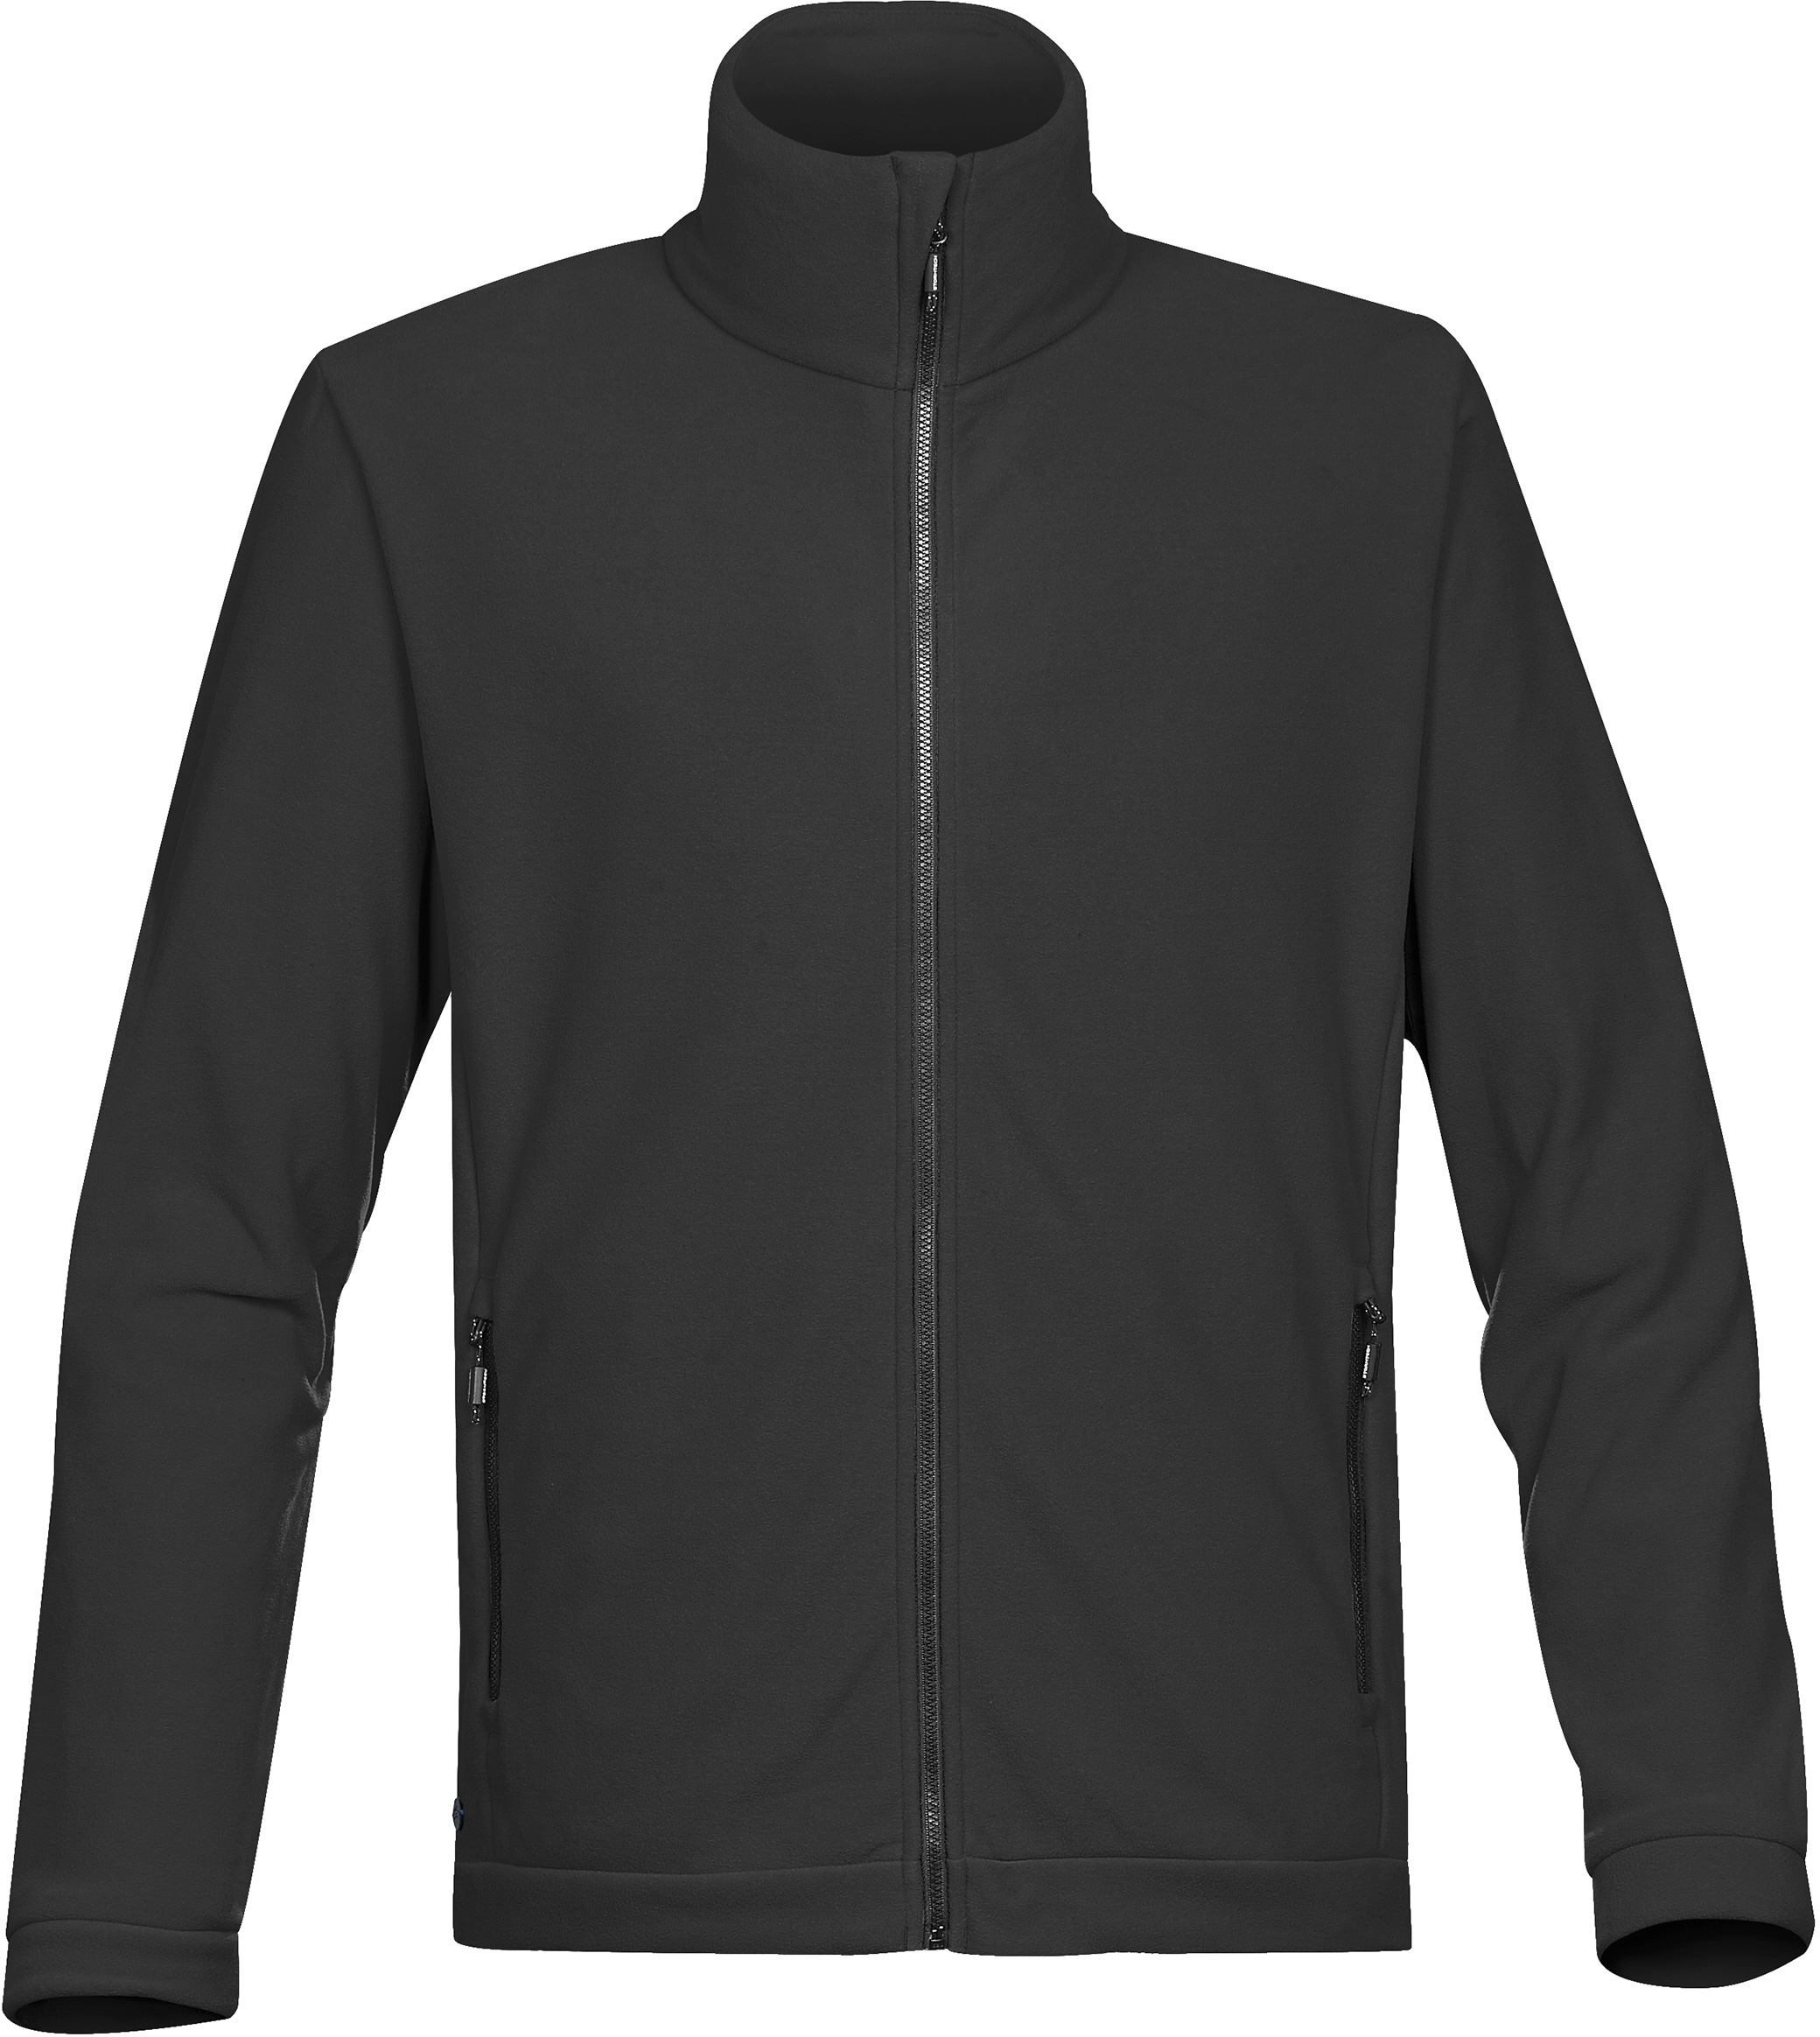 Stormtech NFX-1 - Men's Nitro Microfleece Jacket